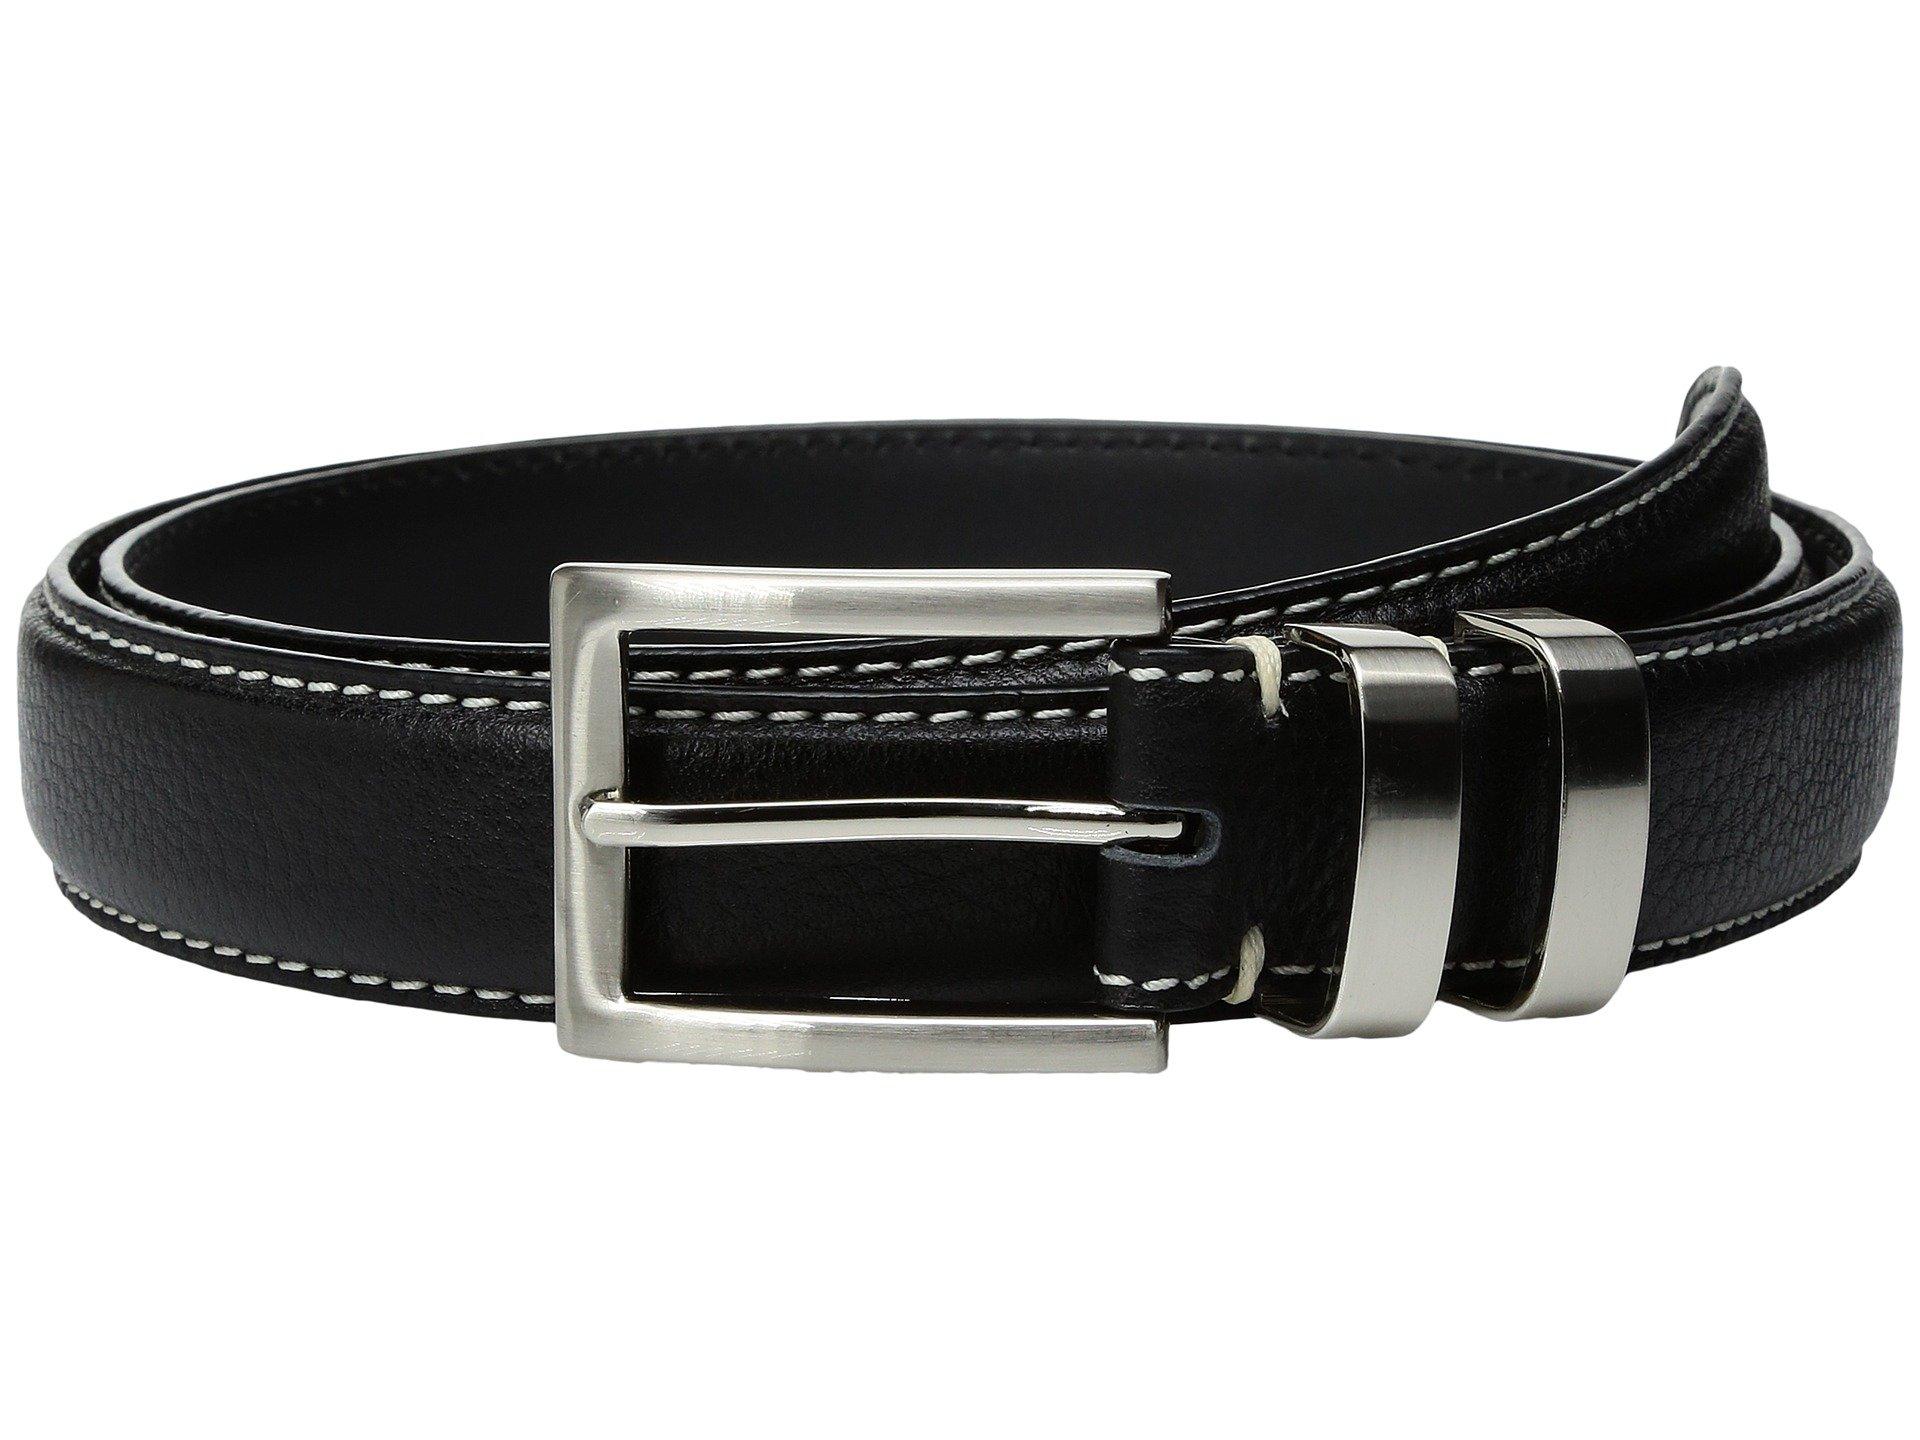 Correa o Cinturon para Hombre Florsheim 32mm Full Grain Leather Belt  + Florsheim en VeoyCompro.net